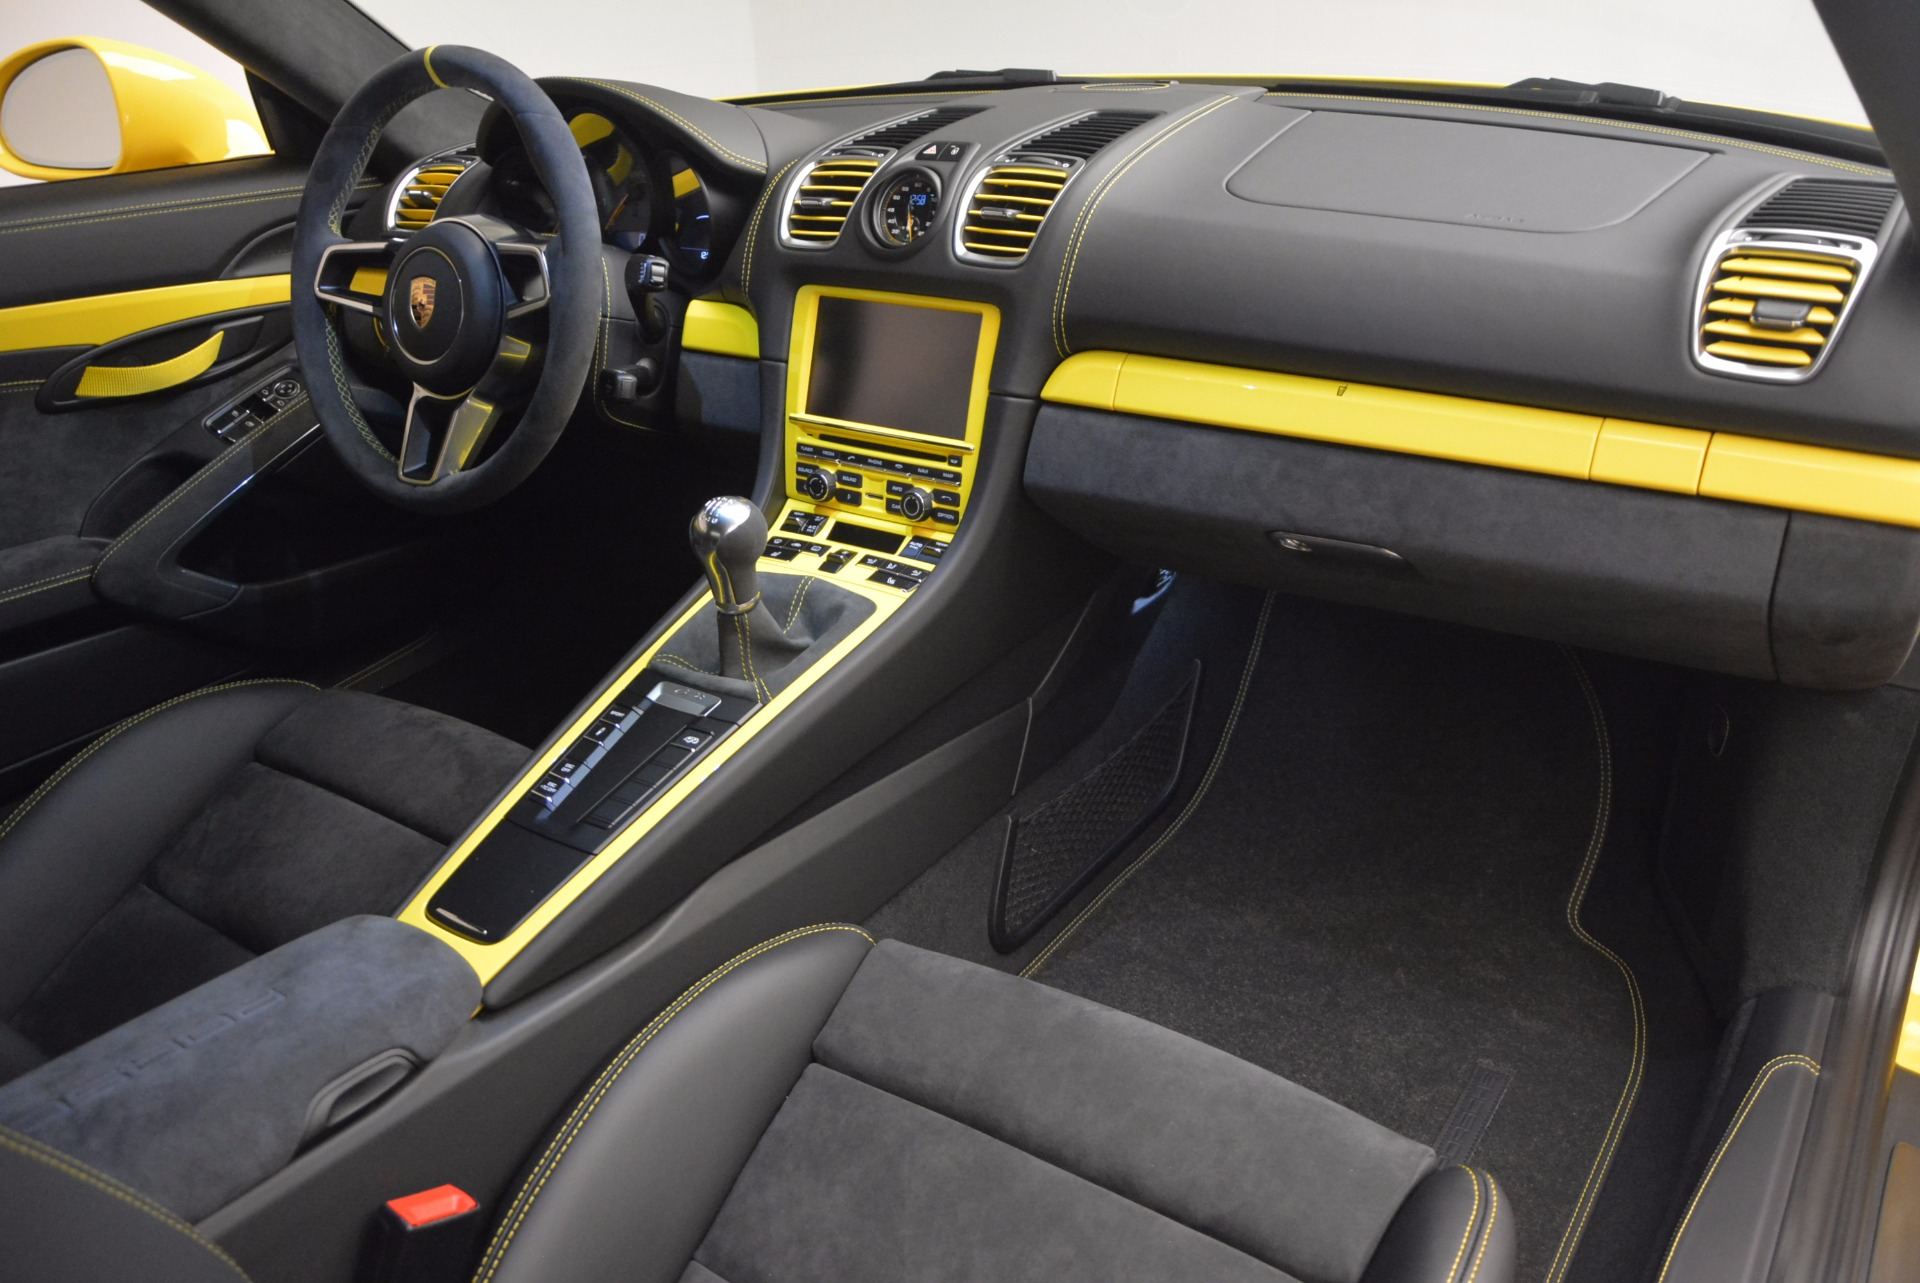 Used 2016 Porsche Cayman GT4 For Sale In Greenwich, CT. Alfa Romeo of Greenwich, 7240 1401_p17